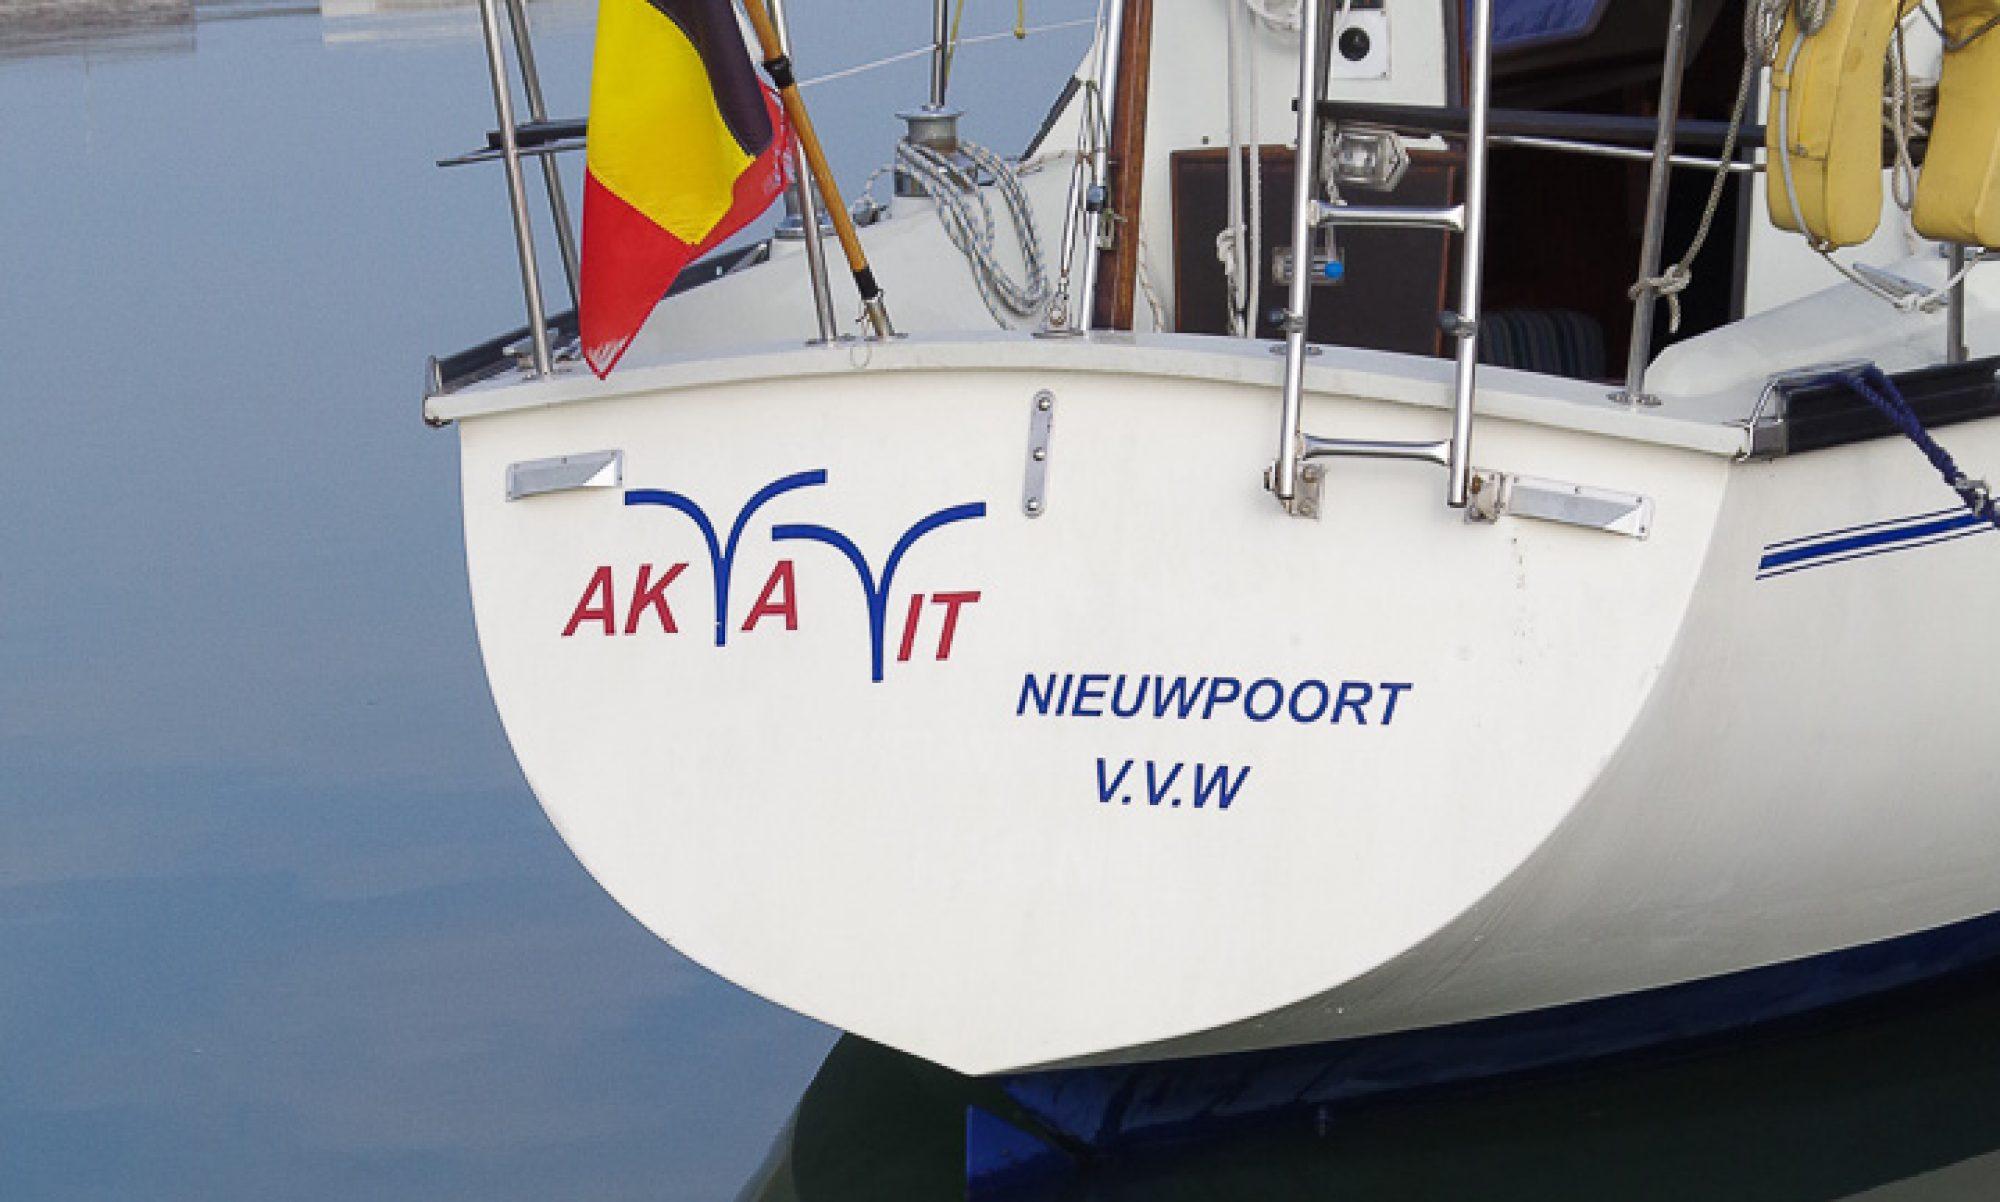 Akvavit